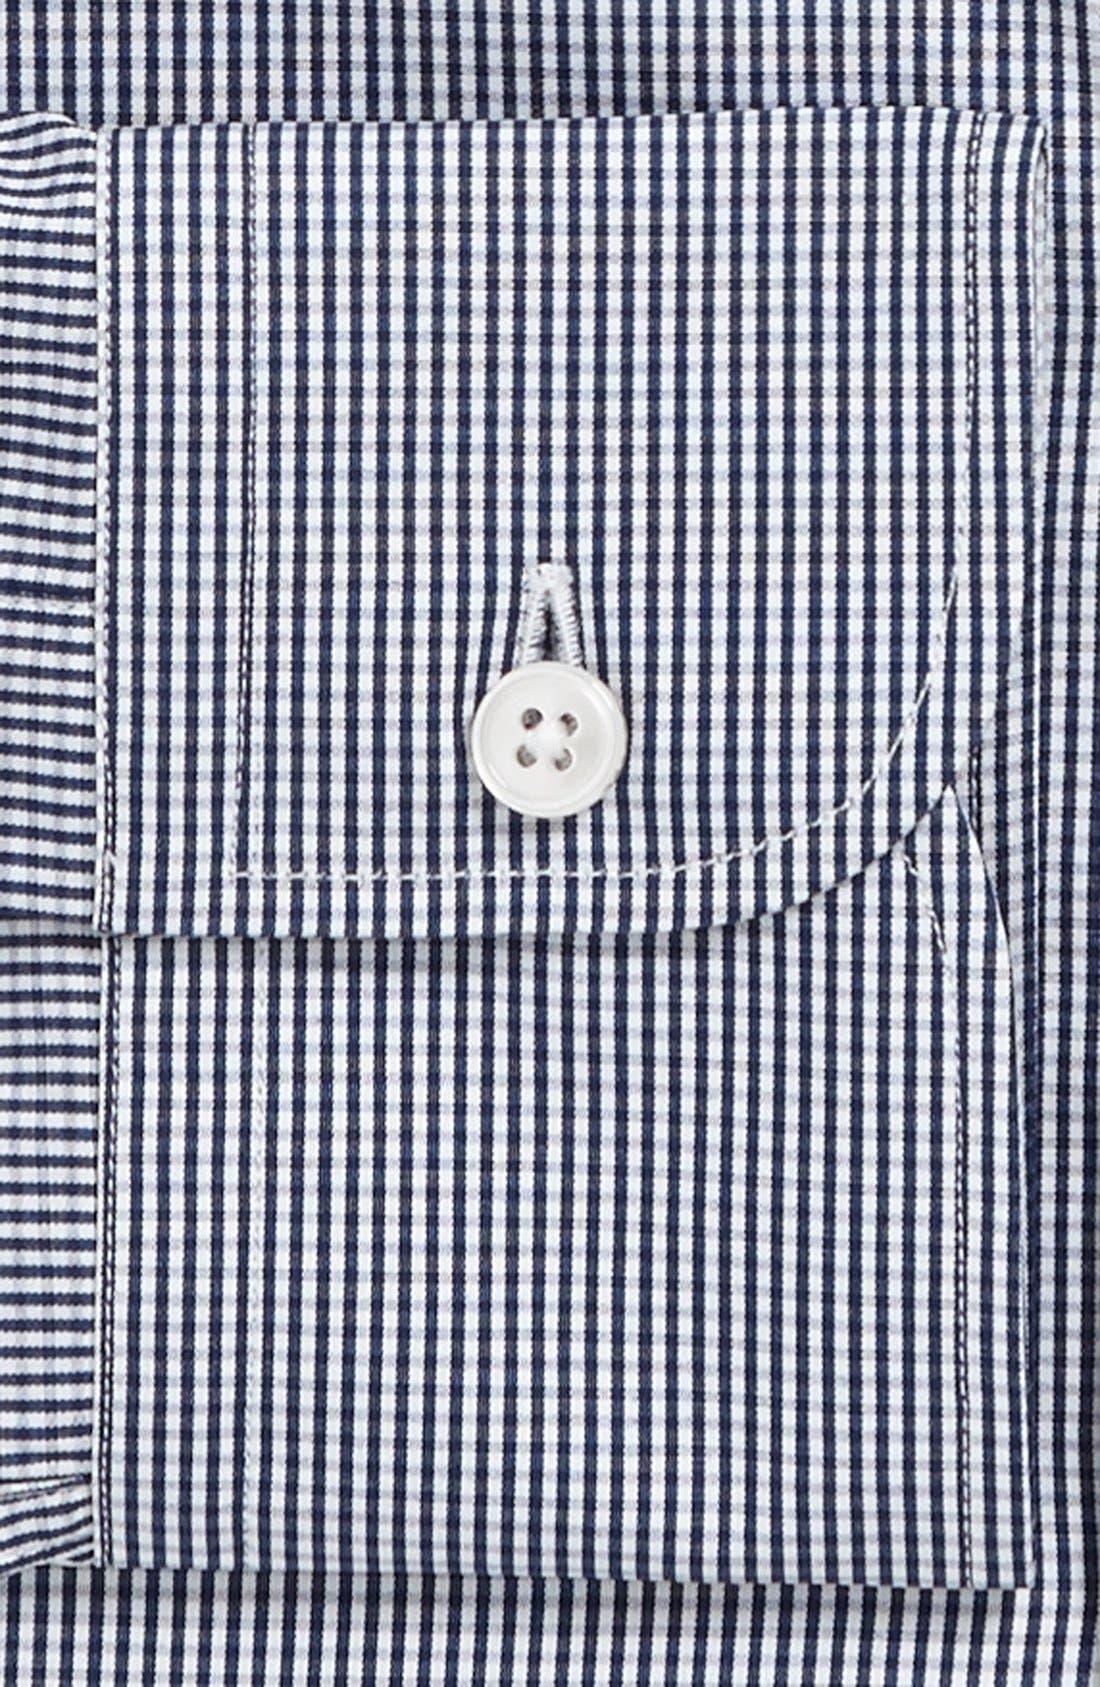 Alternate Image 2  - Z Zegna Slim Fit Micro Check Dress Shirt